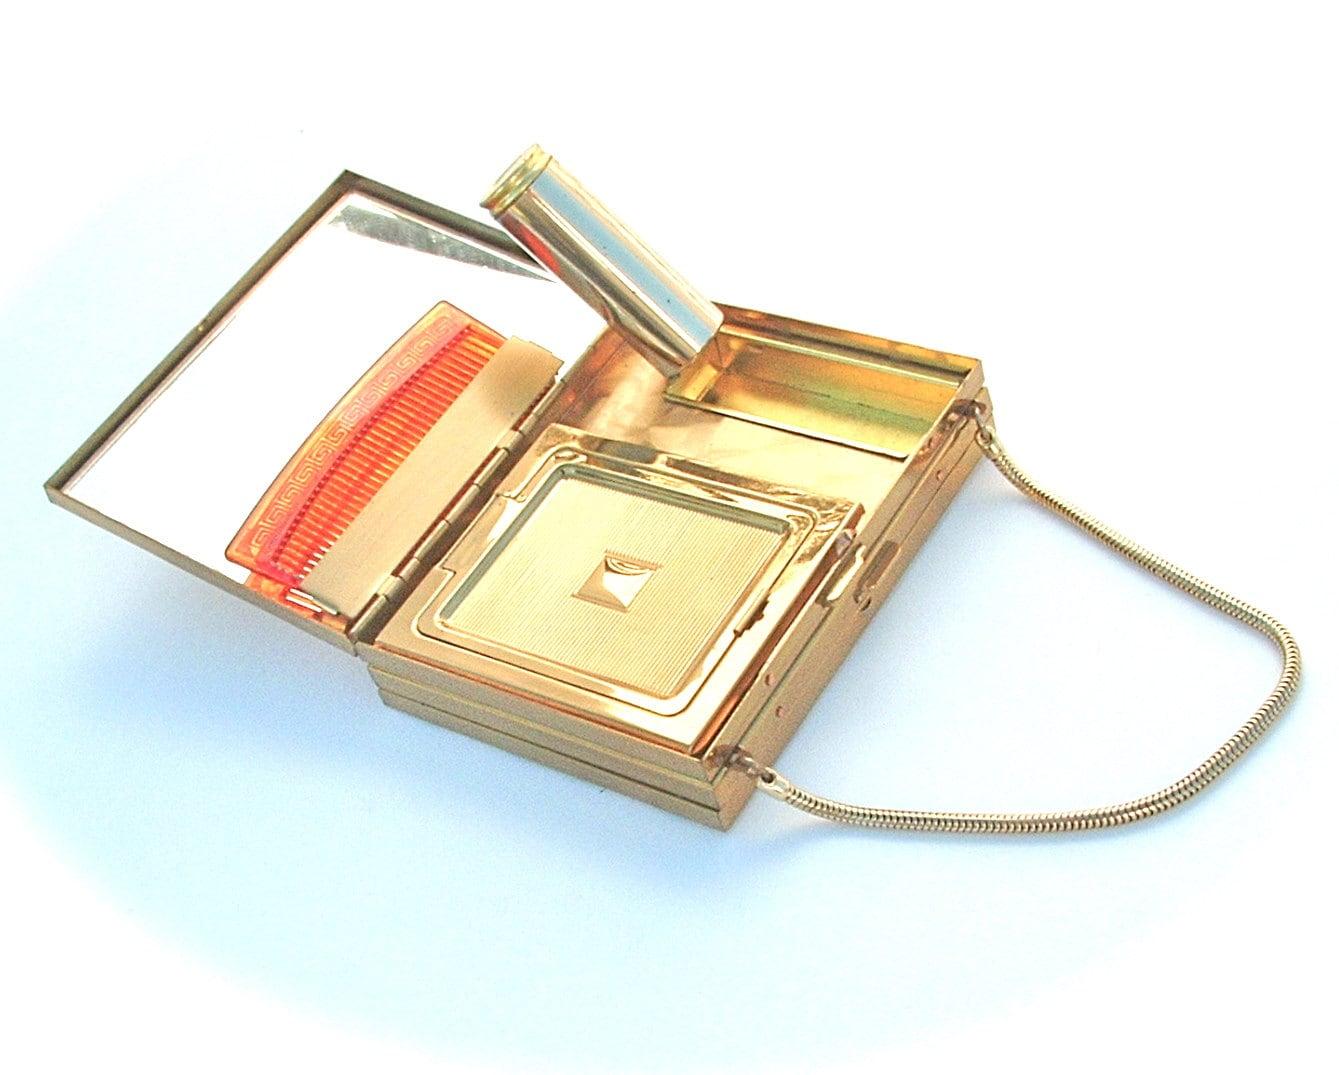 Vintage Compact Coin Purse Case Lipstick Holder Woven Gold